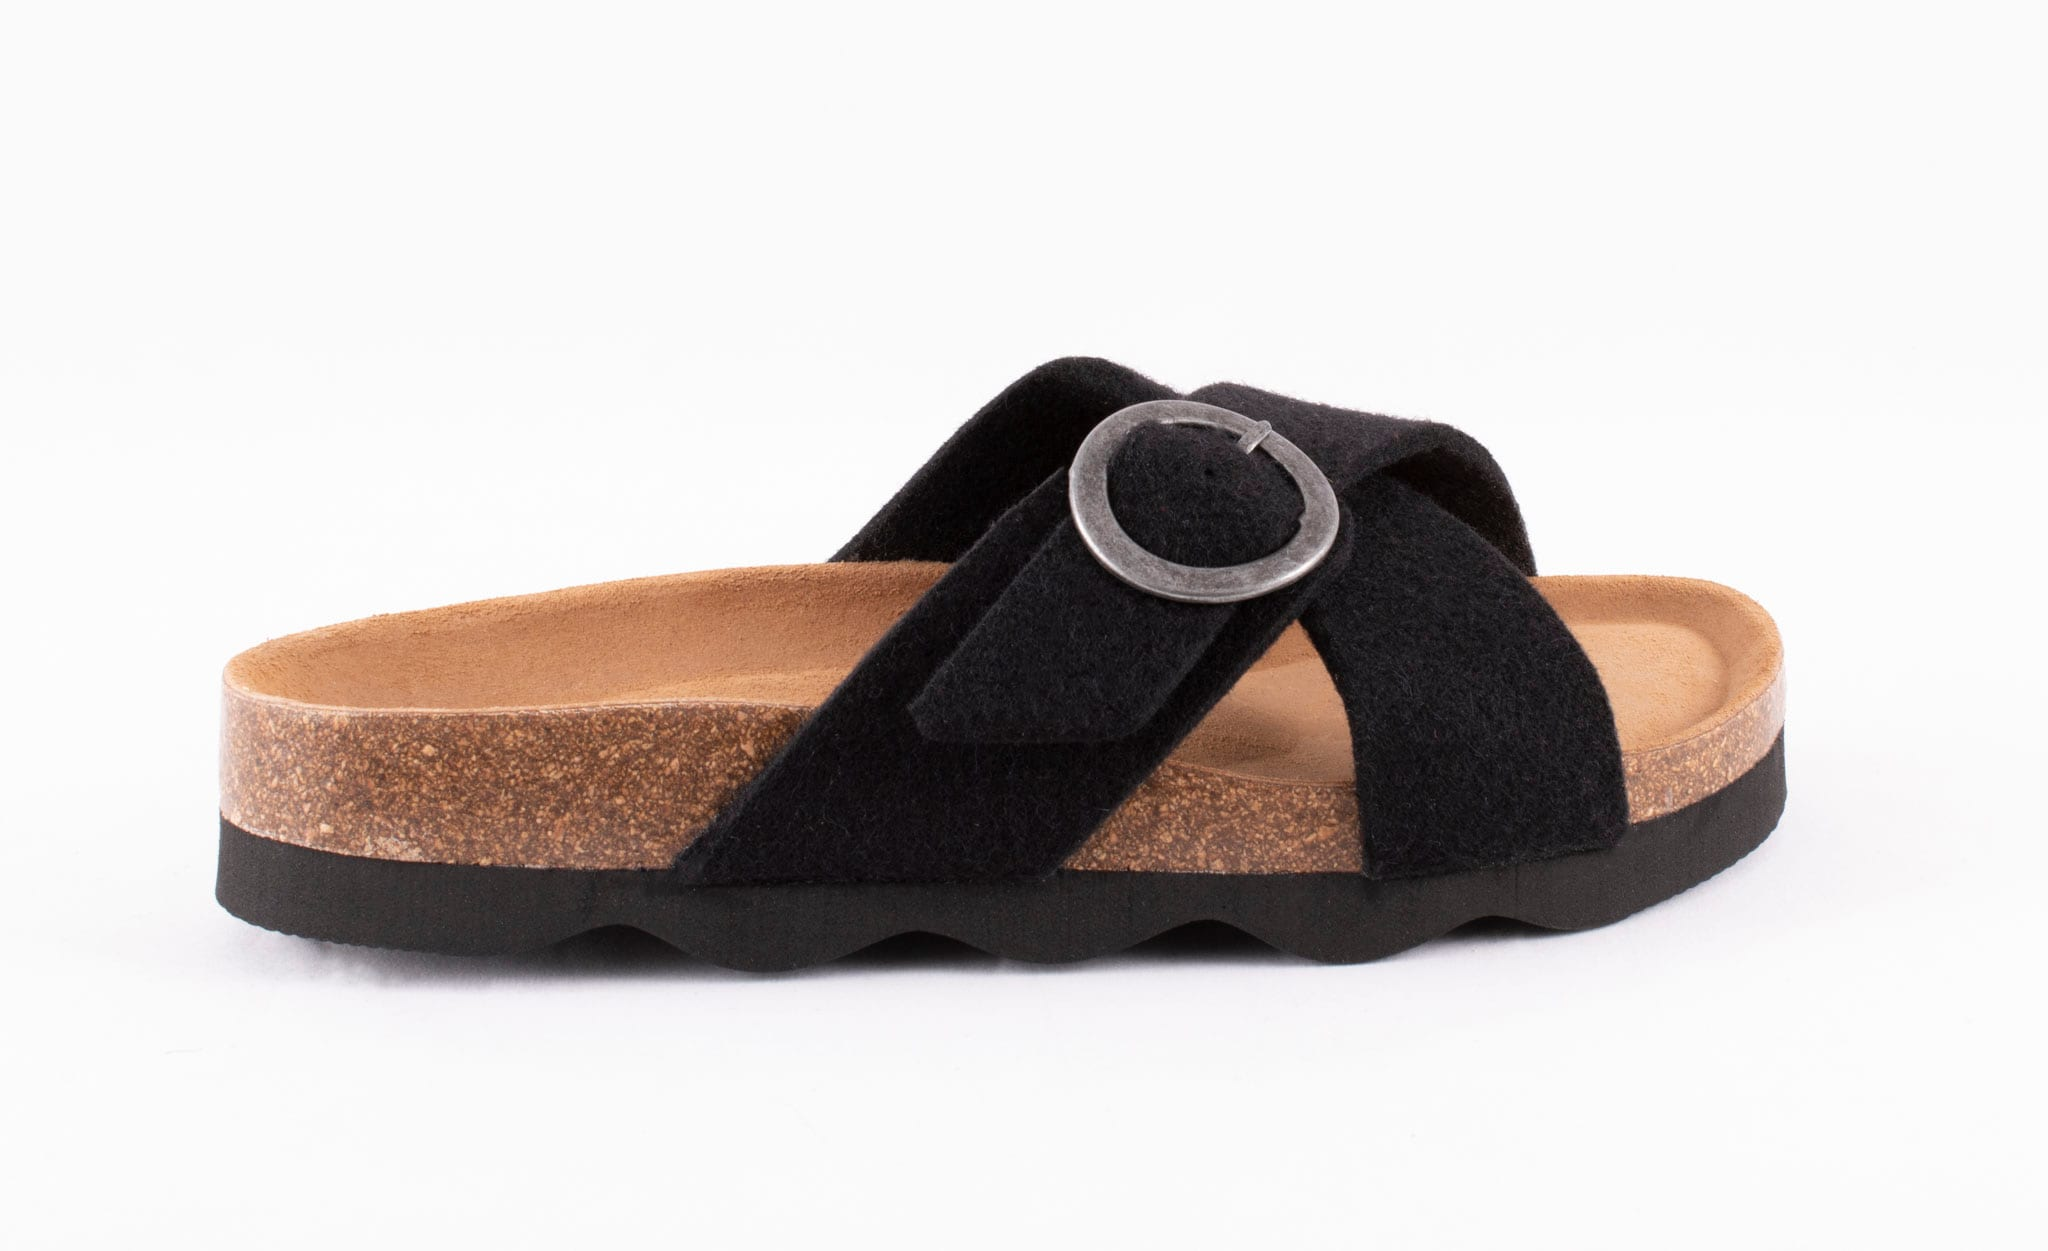 Shepherd Marianne sandals